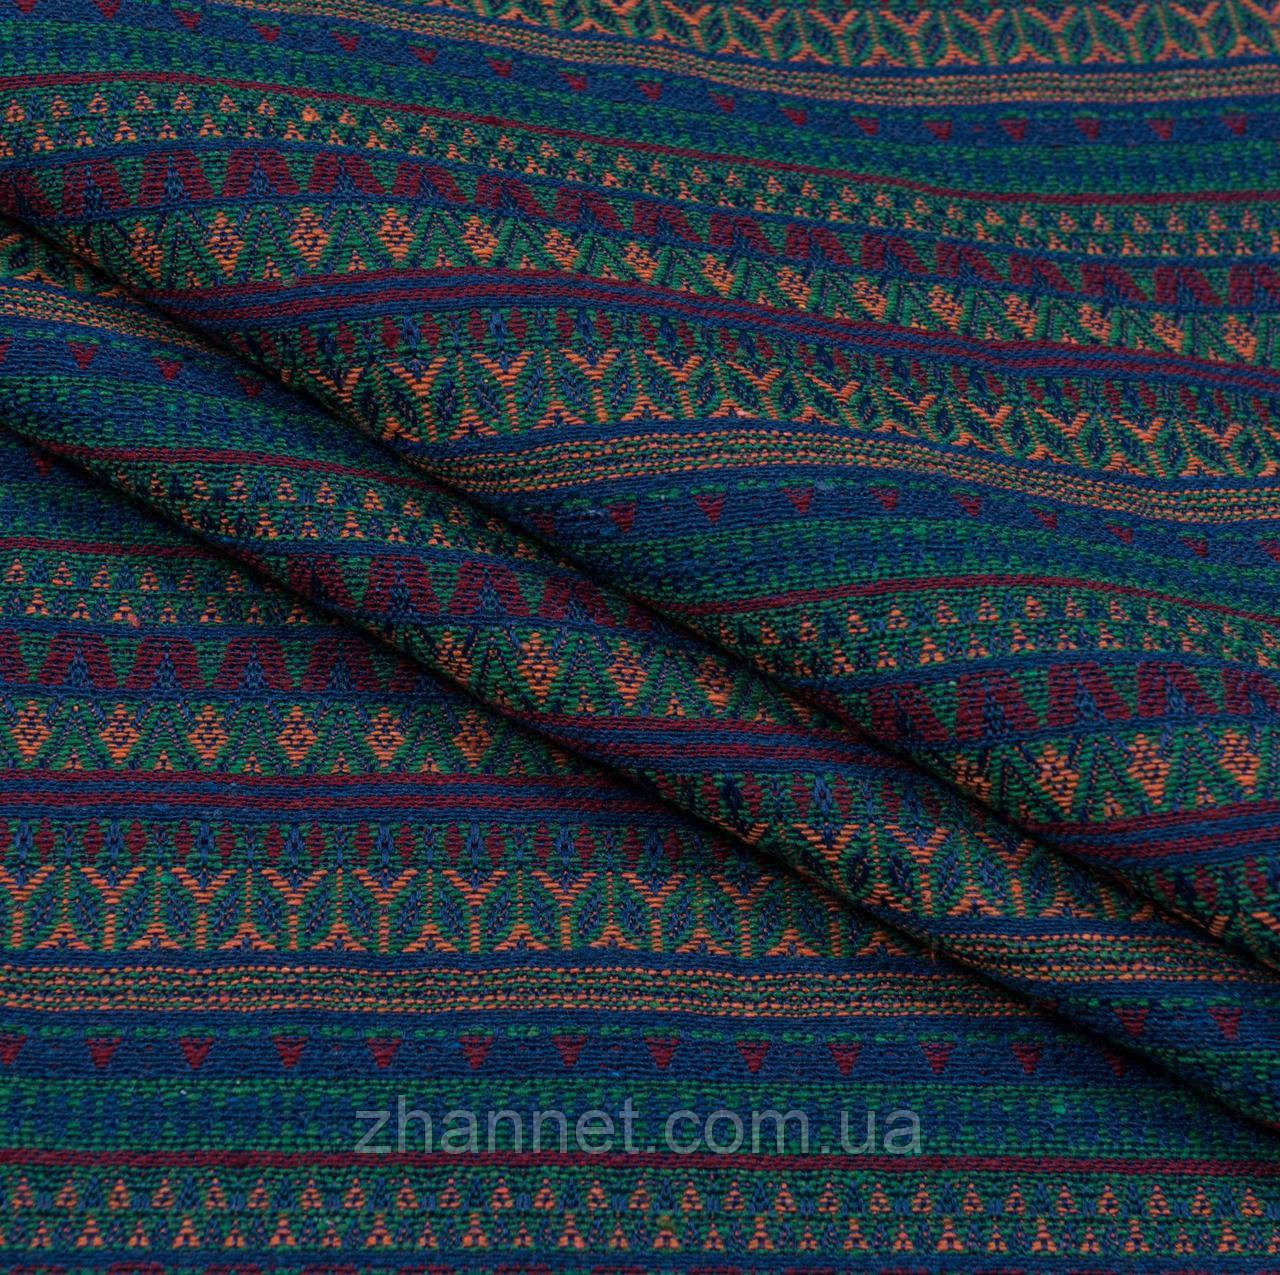 Ткань гобелен орнамент Иза